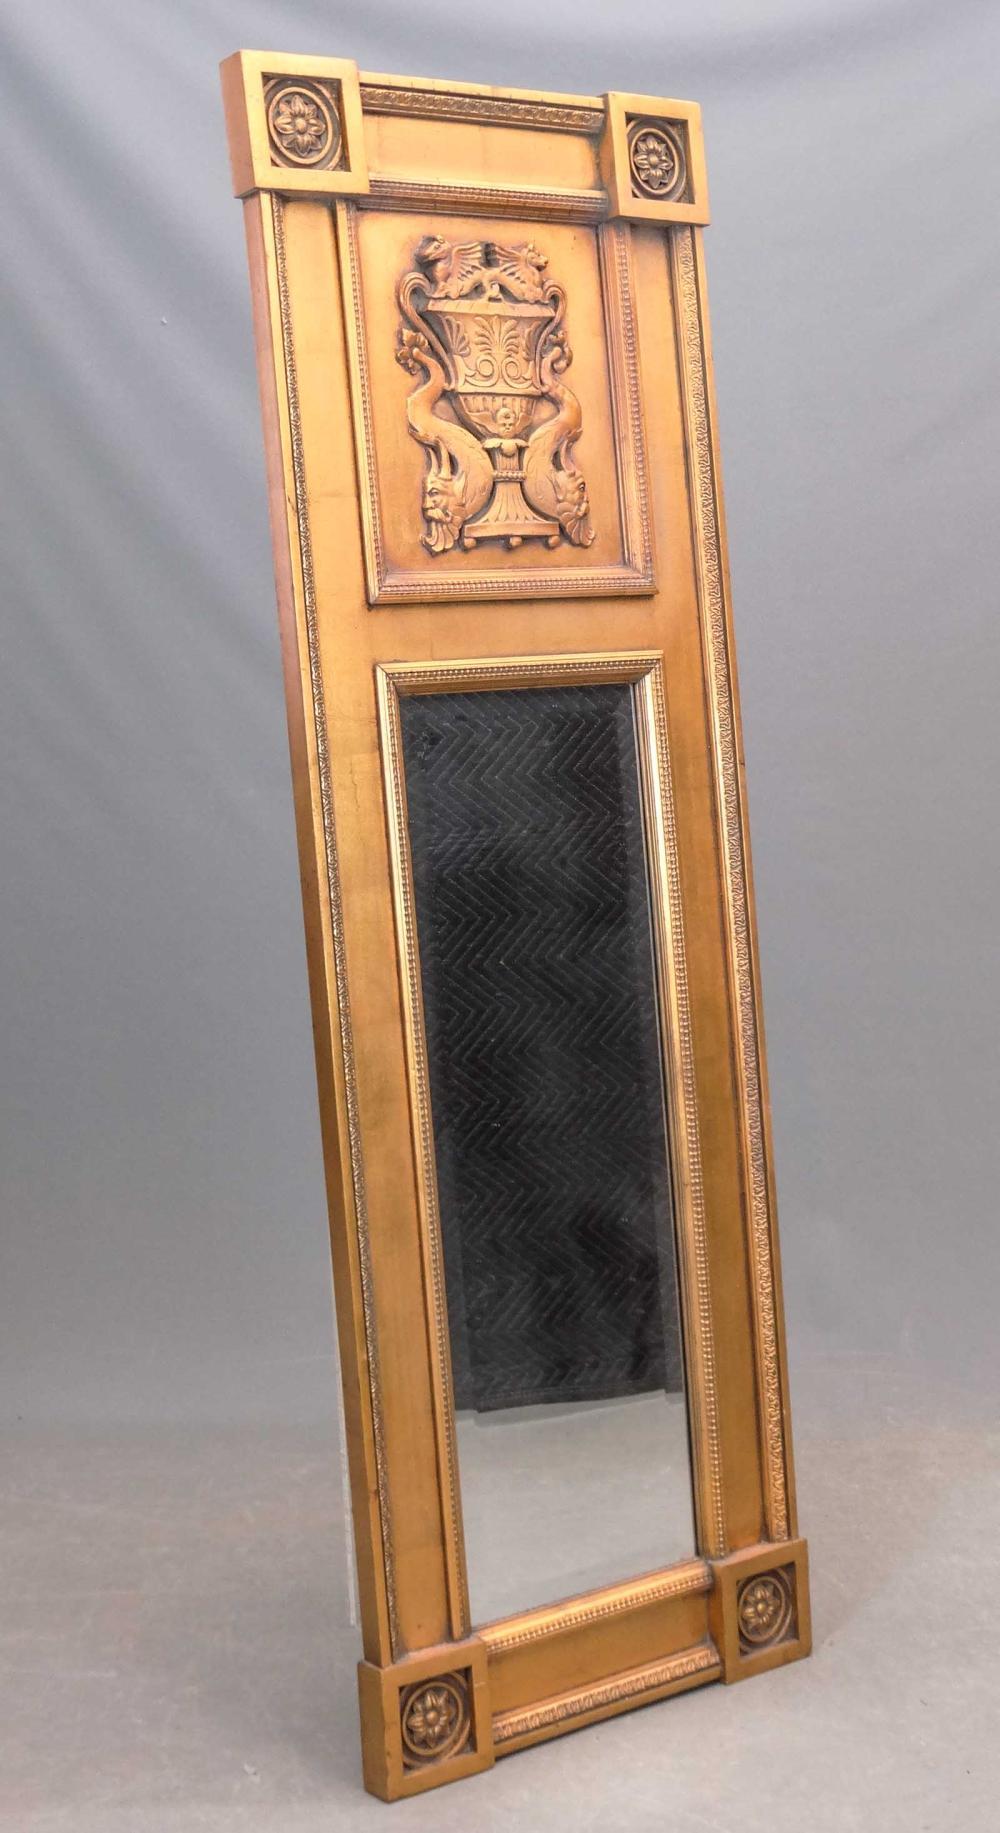 Lot 164: Decorative Mirror